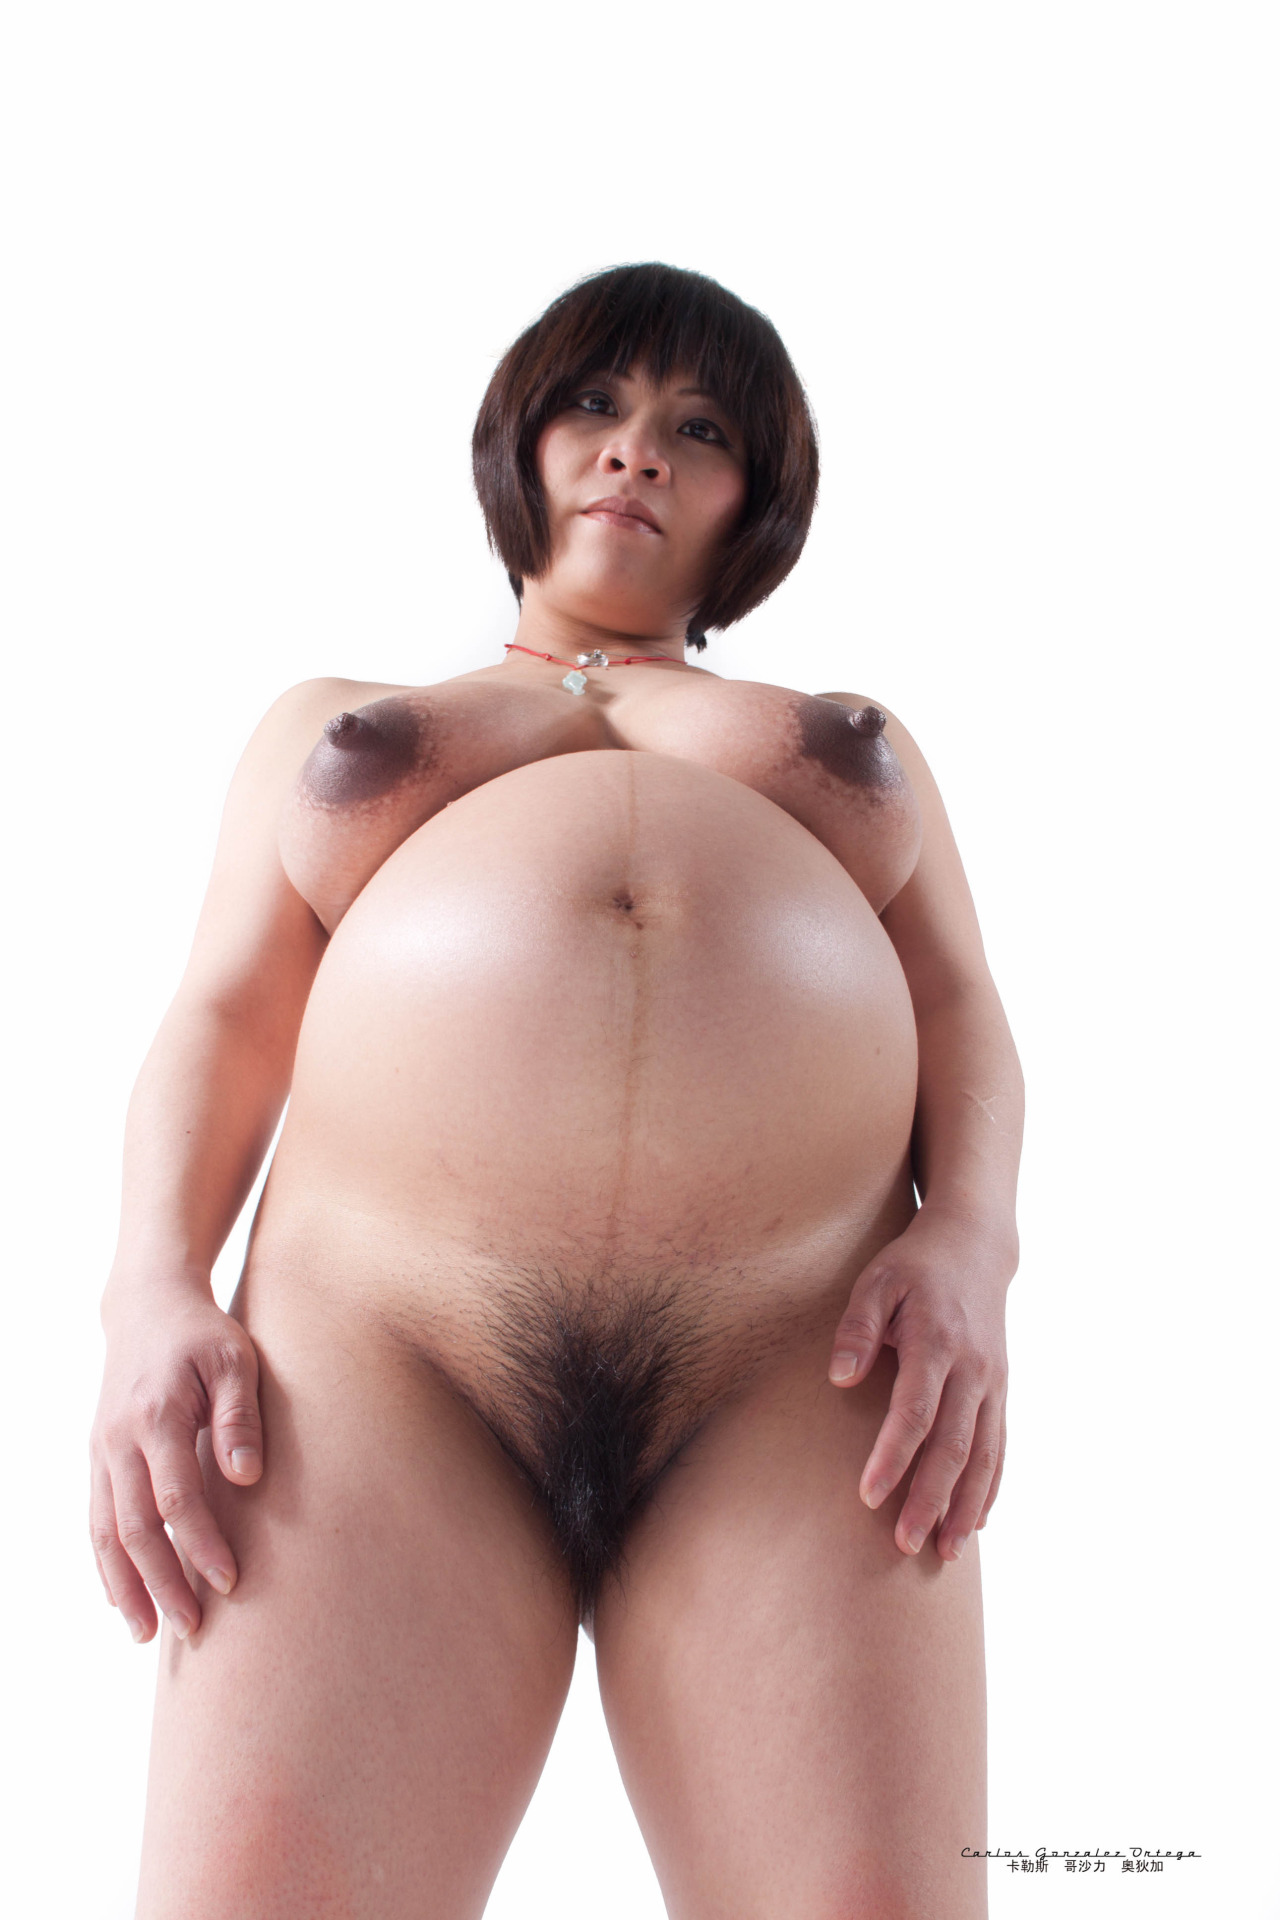 Asian Hospital Porn Sex japanese asian pregnant women porn - megapornx